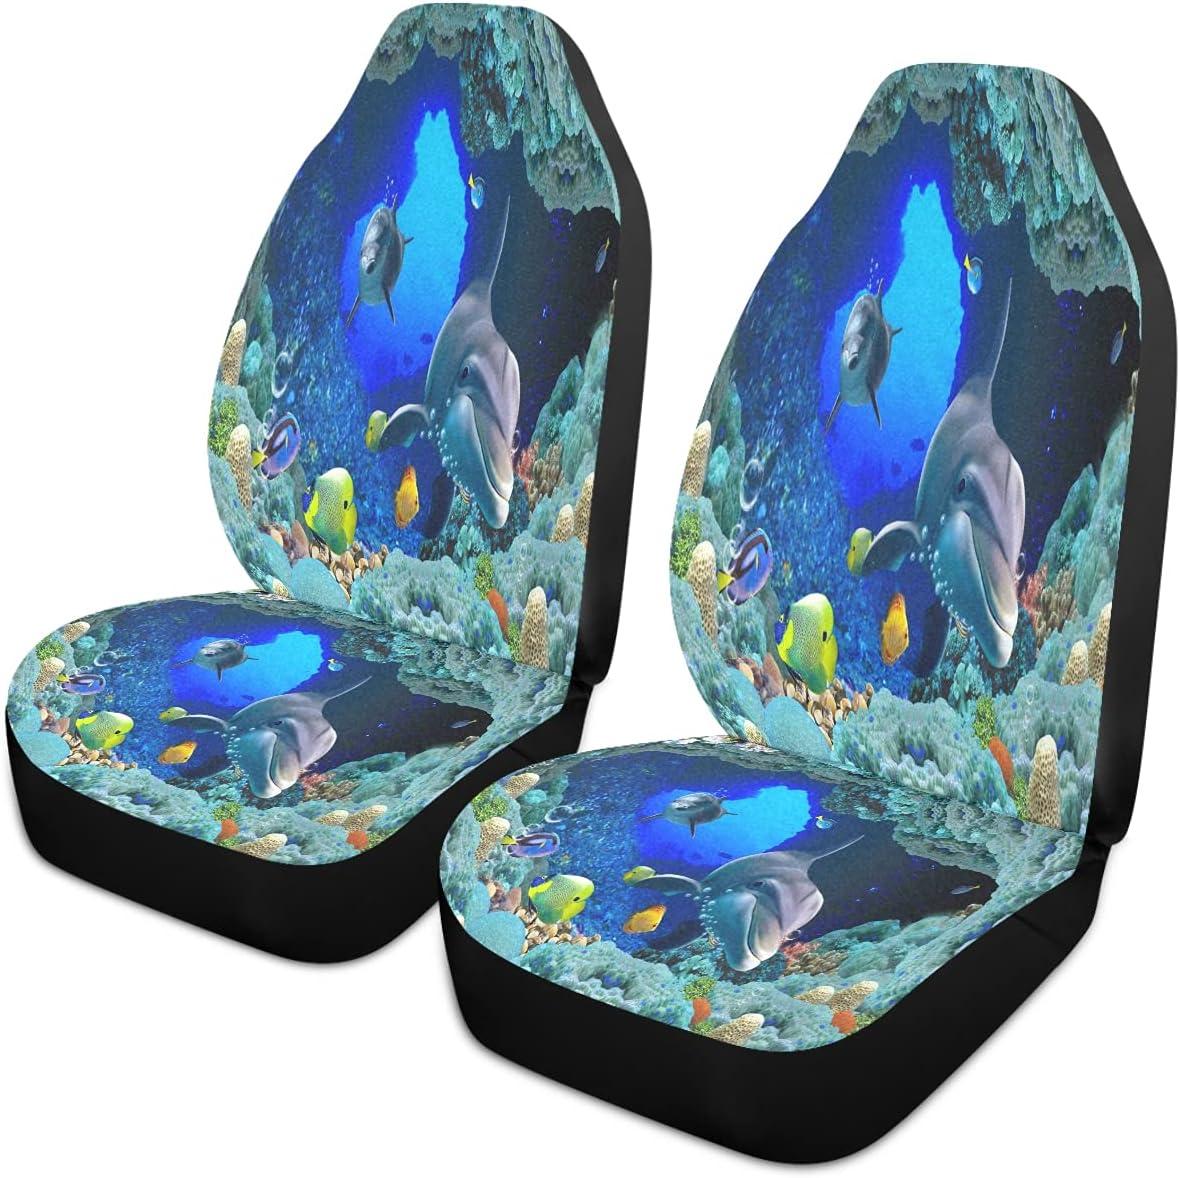 Oarencol Underwater Shark Car Seat Animal Fish Sea Covers Univer Max 51% OFF Ranking TOP14